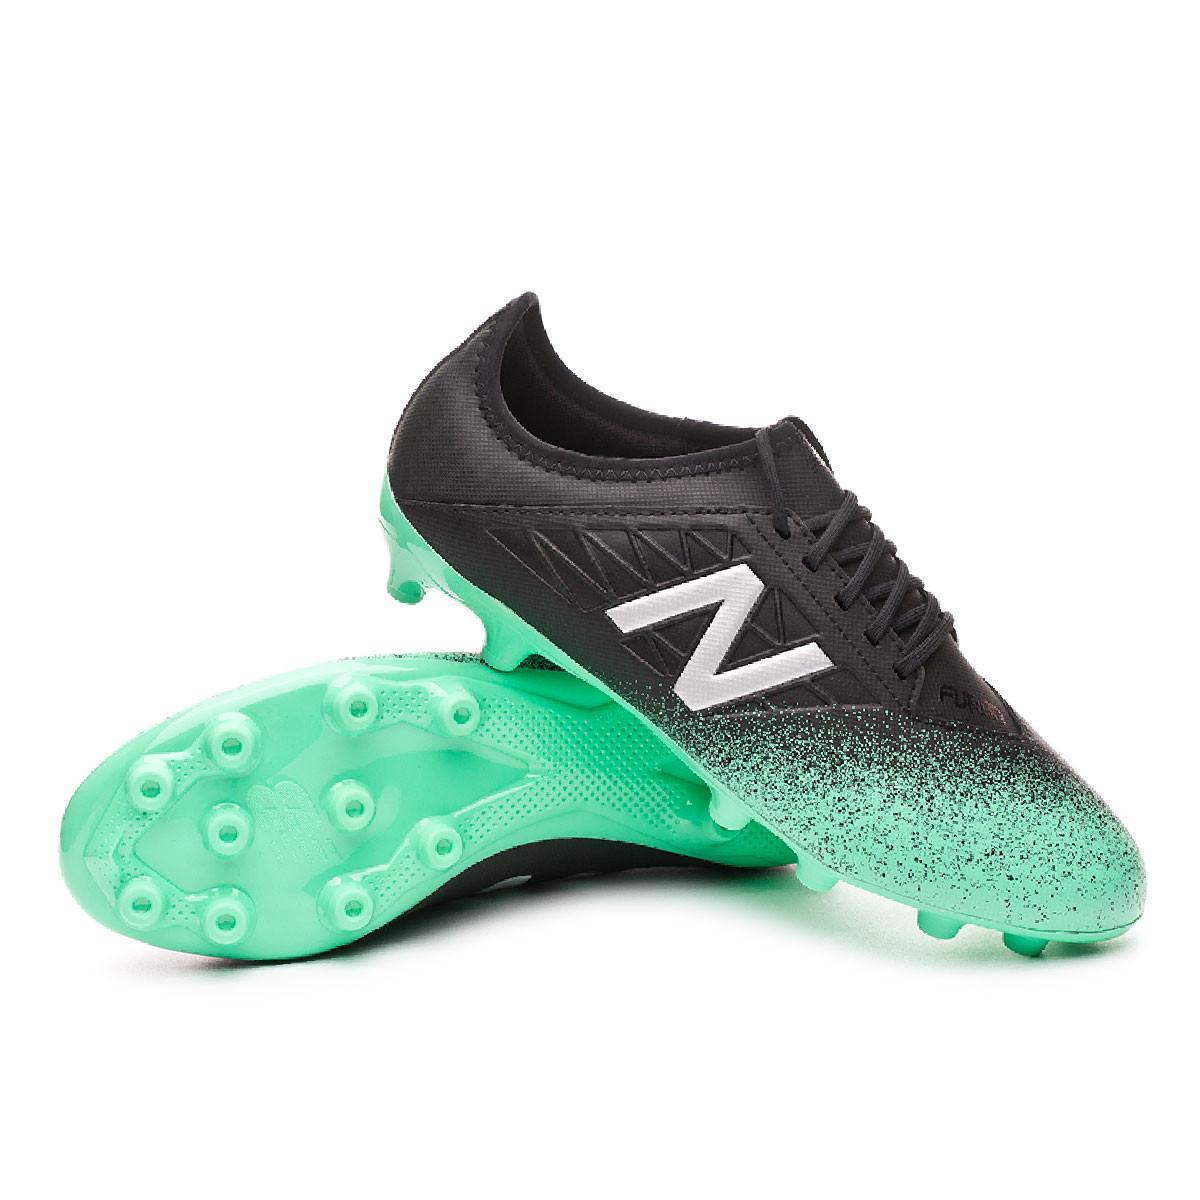 recoger Moler Degenerar  Football Boots New Balance Furon v5 Dispatch AG Neon emerald-Black - Tienda  de fútbol Fútbol Emotion